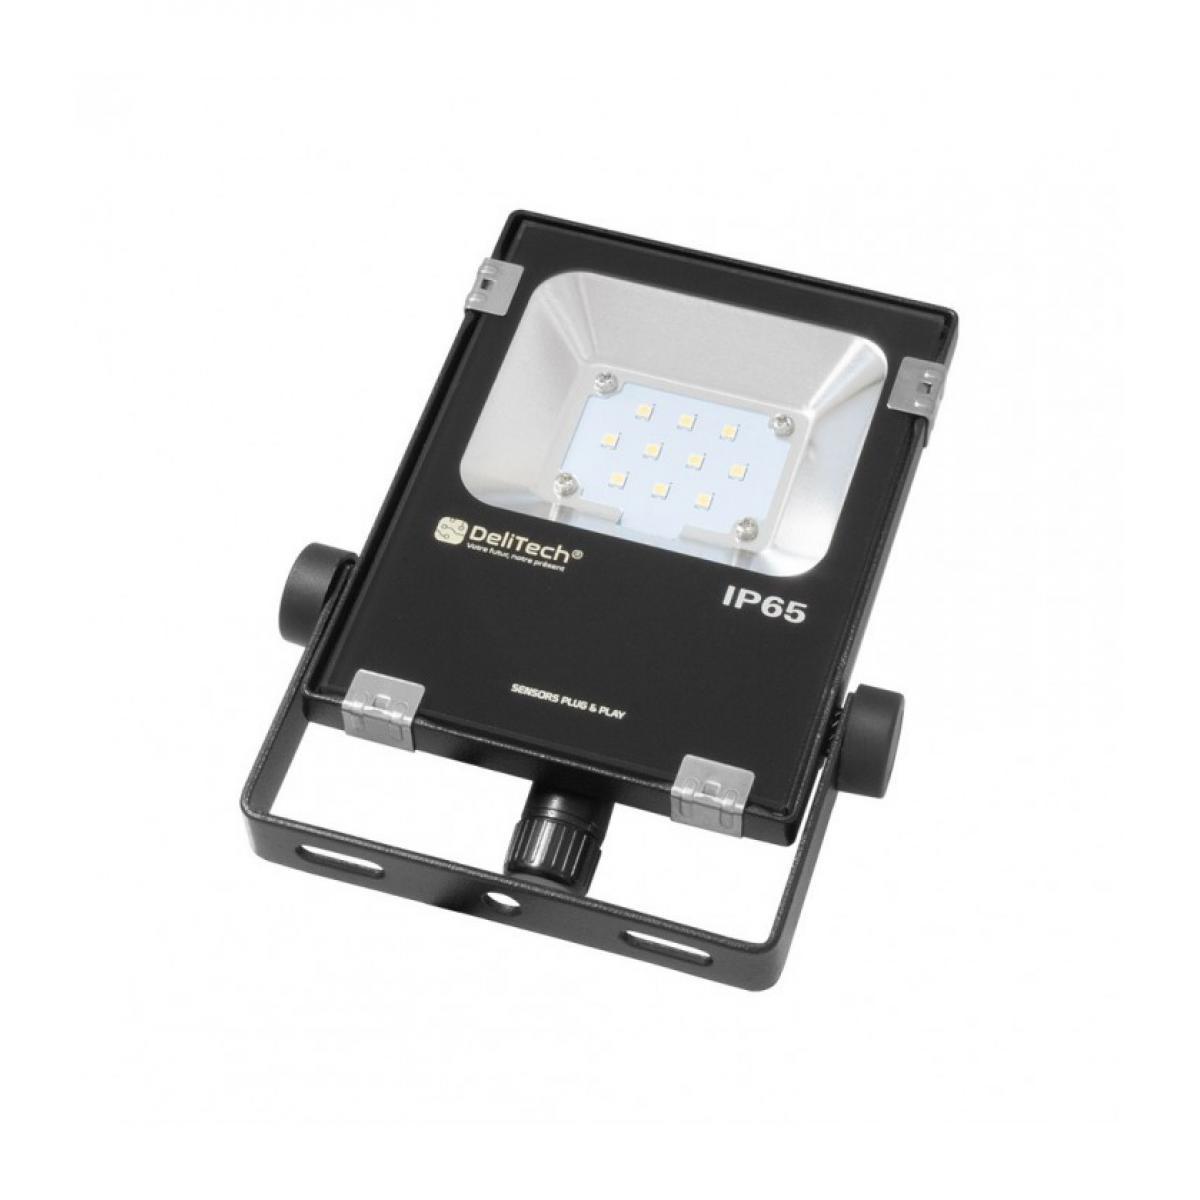 Delitech Projecteur LED NOVA Sensor Ready - 10W - IP65 - DeliTech